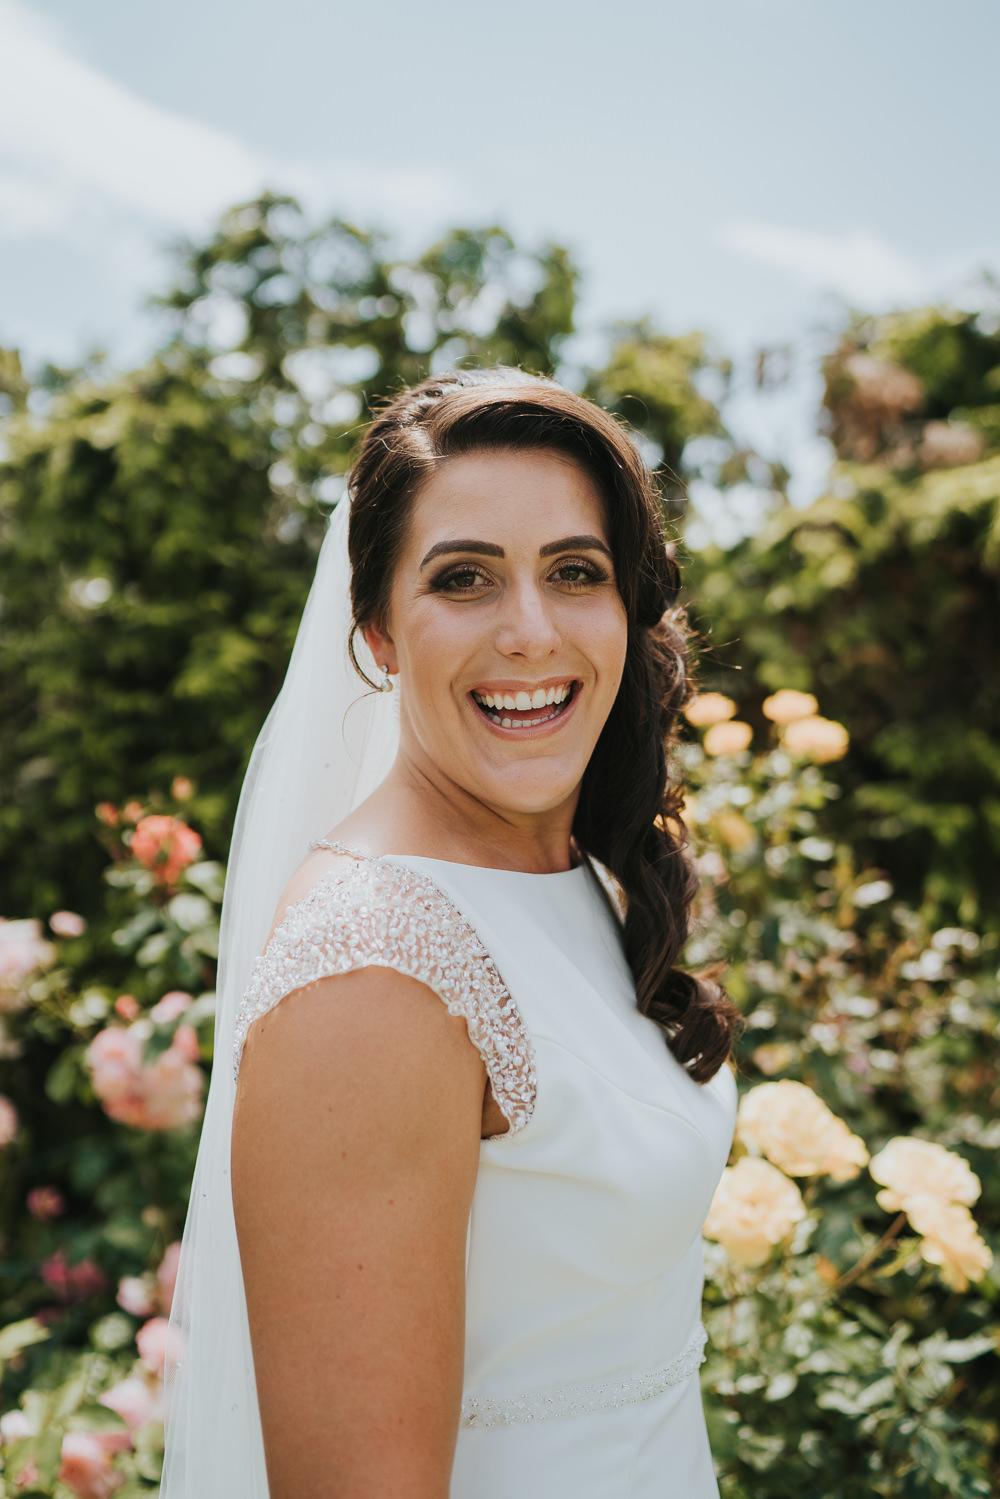 Bride Bridal Hair Style Long Waves Veil High House Weddings Grace Elizabeth Photography